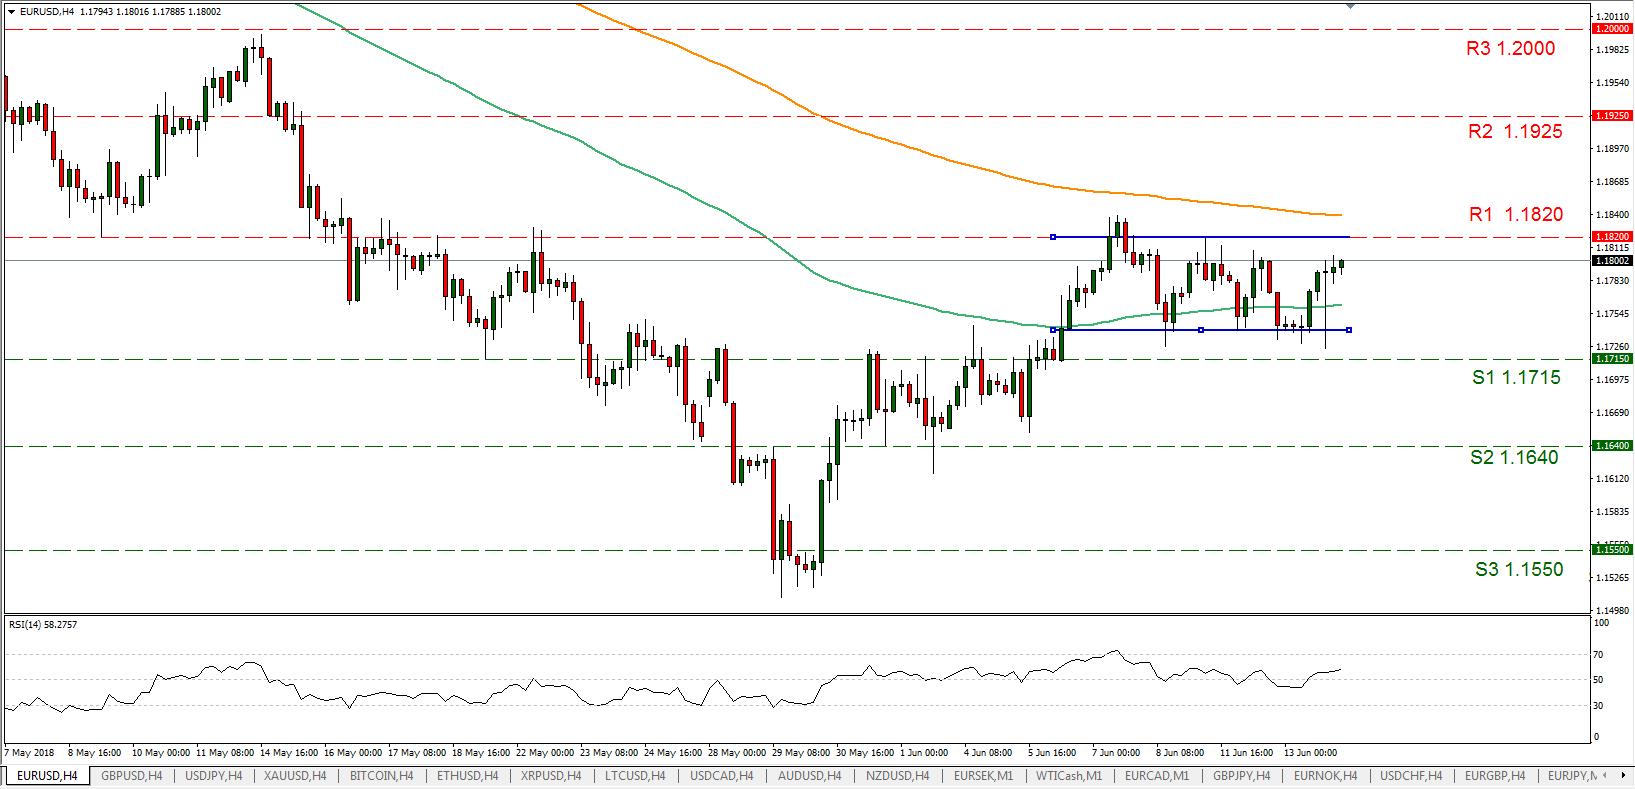 EUR/USD 14/06/2018 | EconAlerts